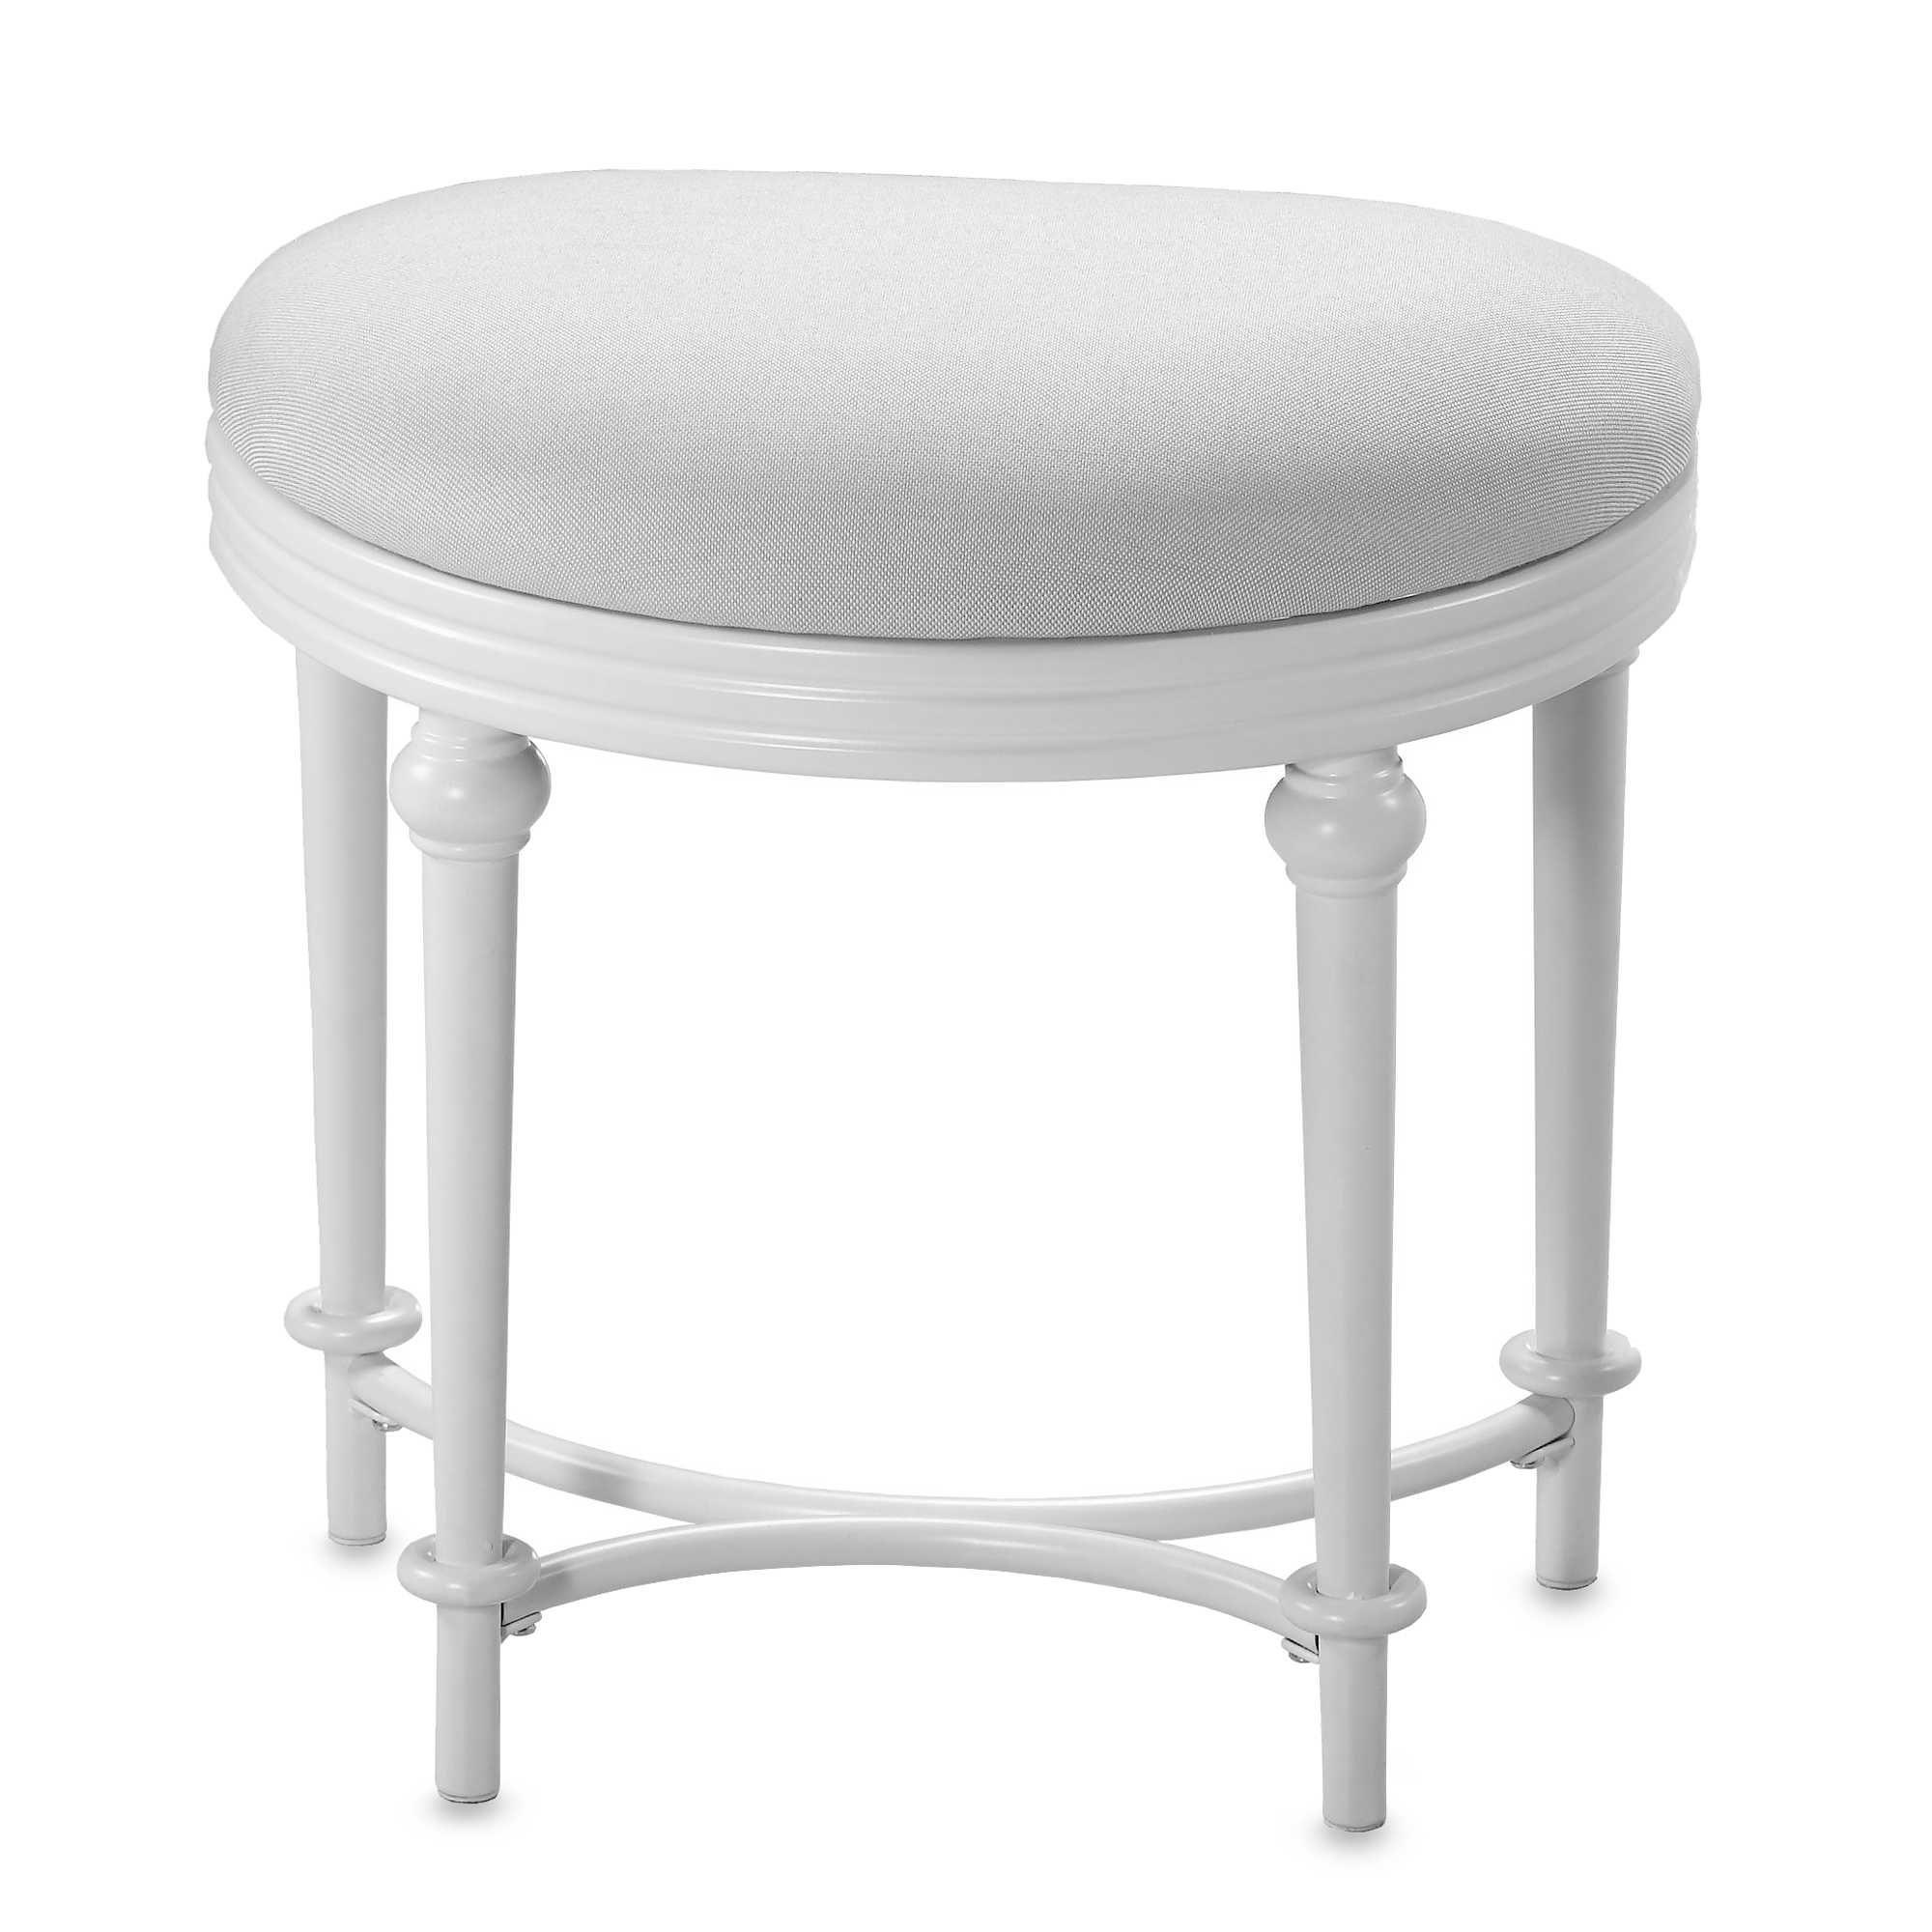 bathroom chrome vanity stool 19931356 chrome vanity stool bathroom white